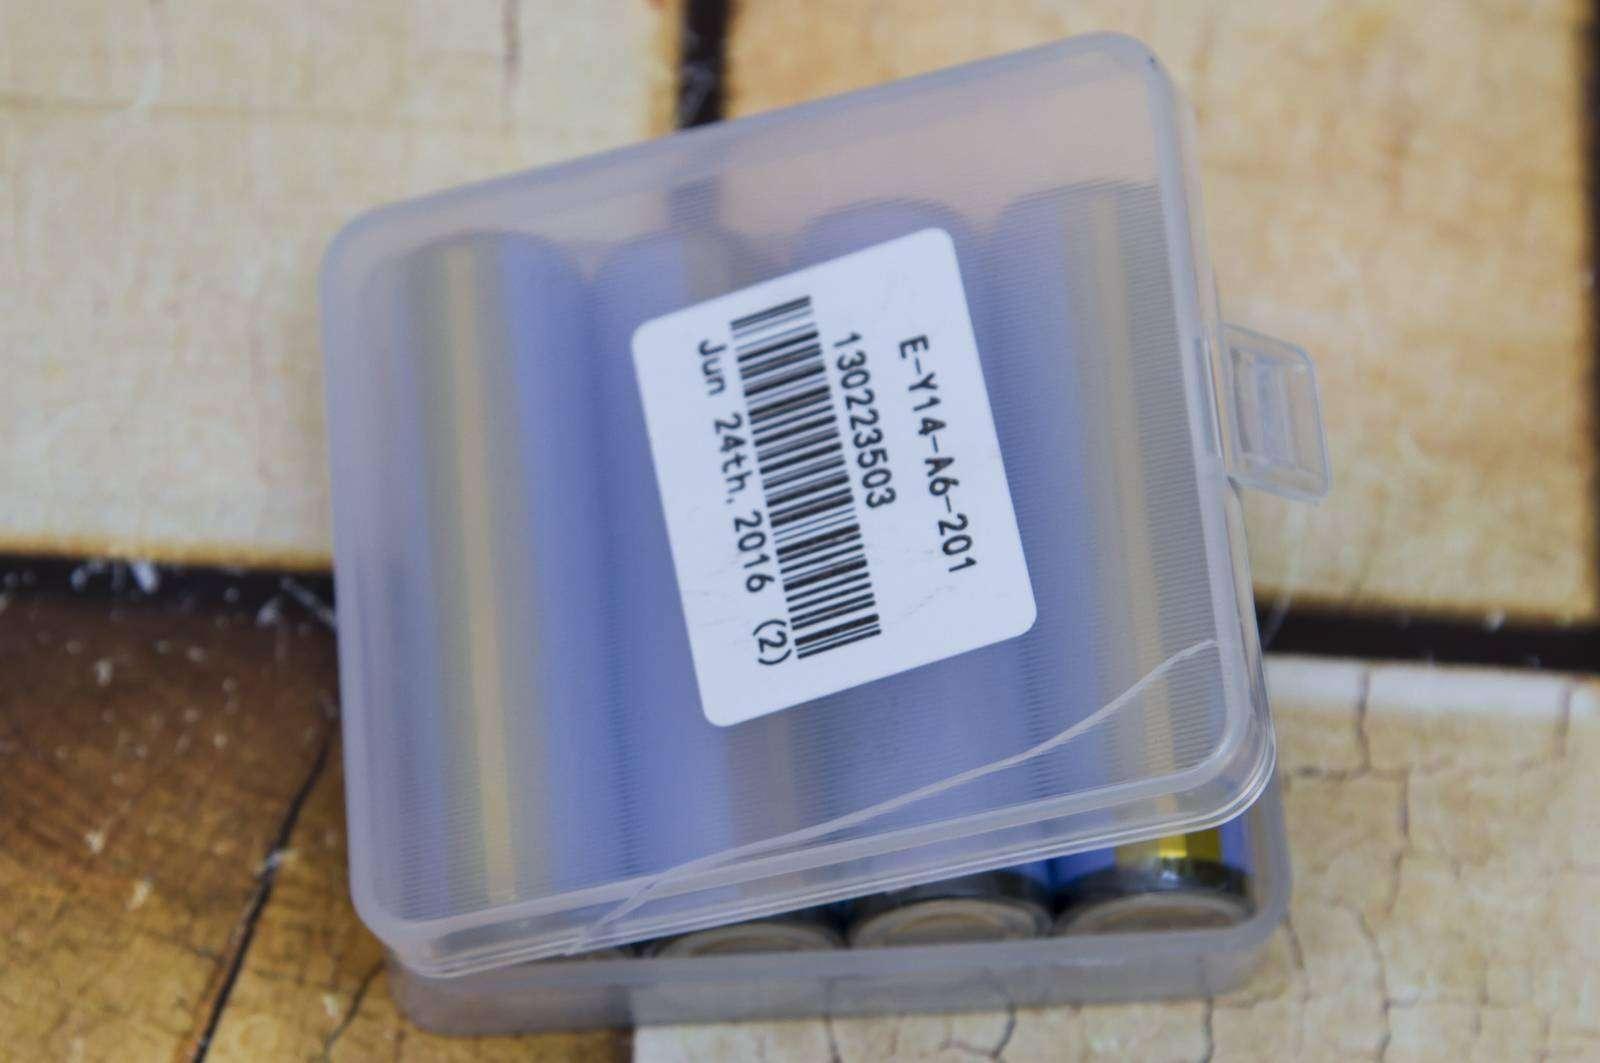 GearBest: Еще раз о Samsung ICR18650 - 28A 18650 2800mAh